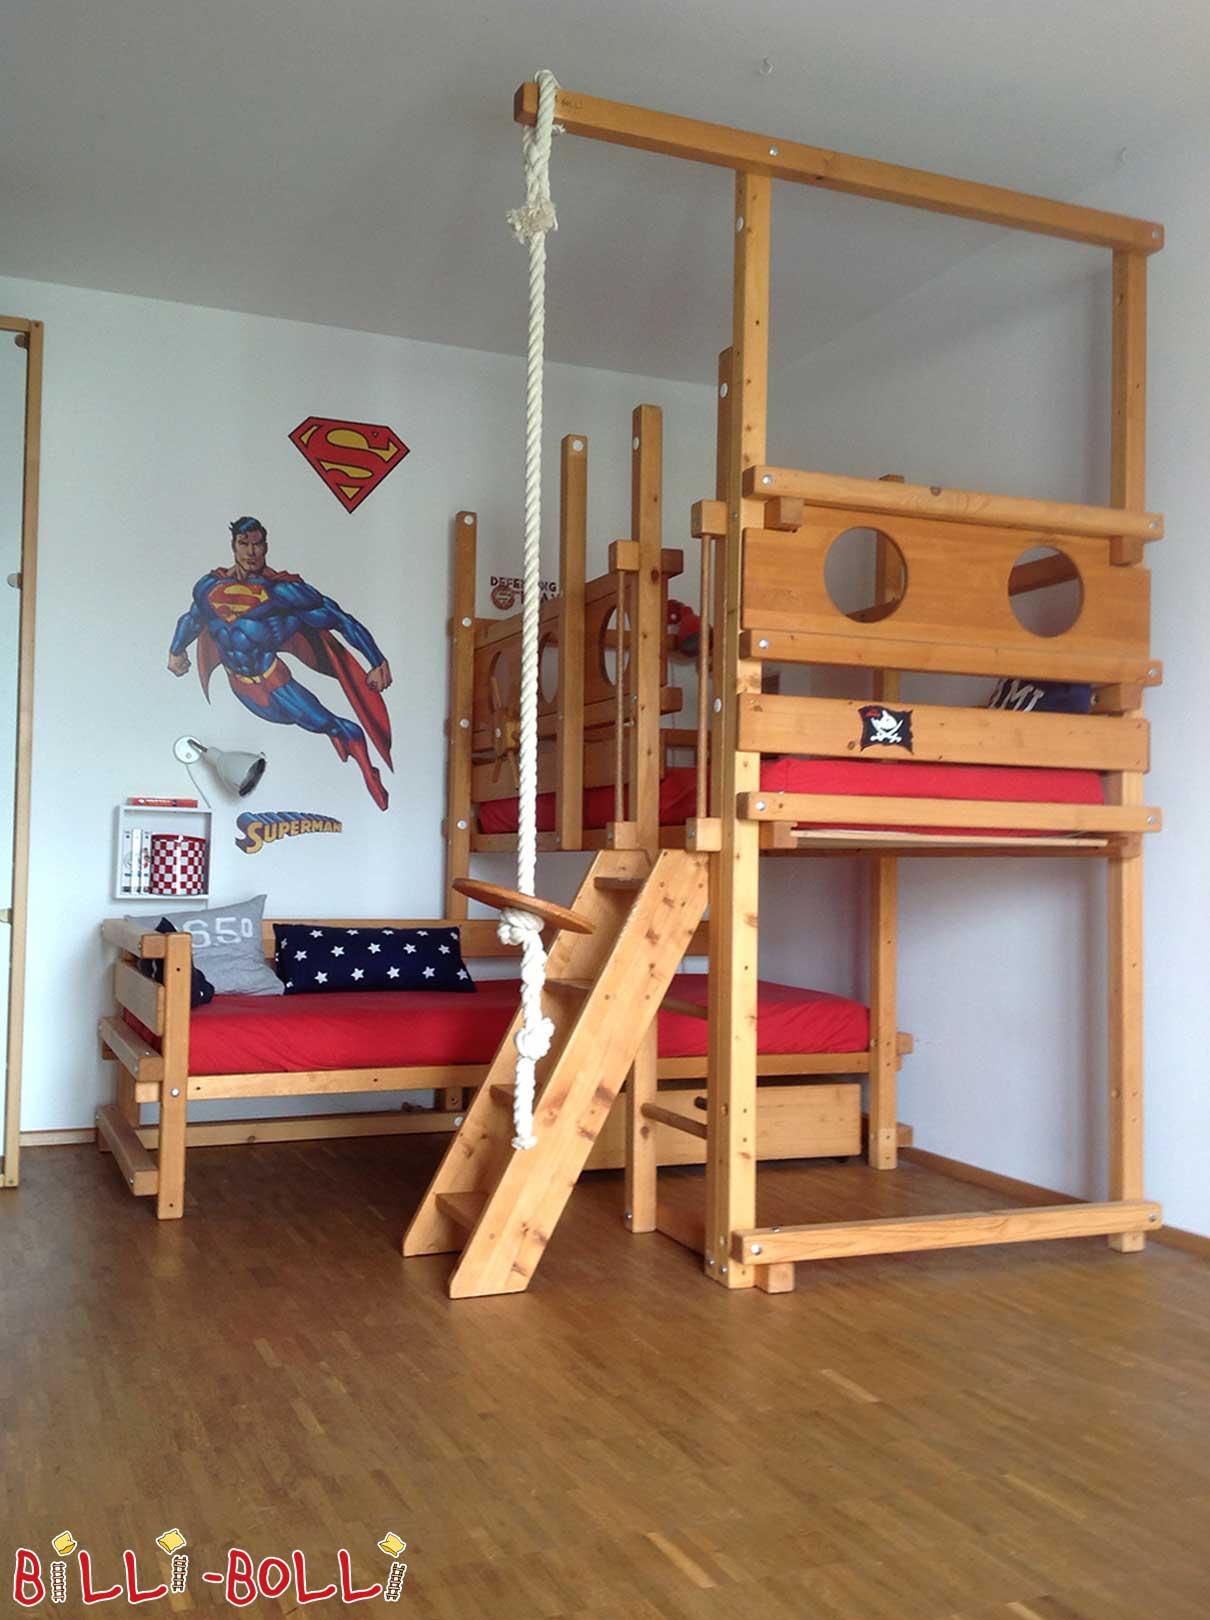 billi bolli billi bolli children playing in a billibolli. Black Bedroom Furniture Sets. Home Design Ideas